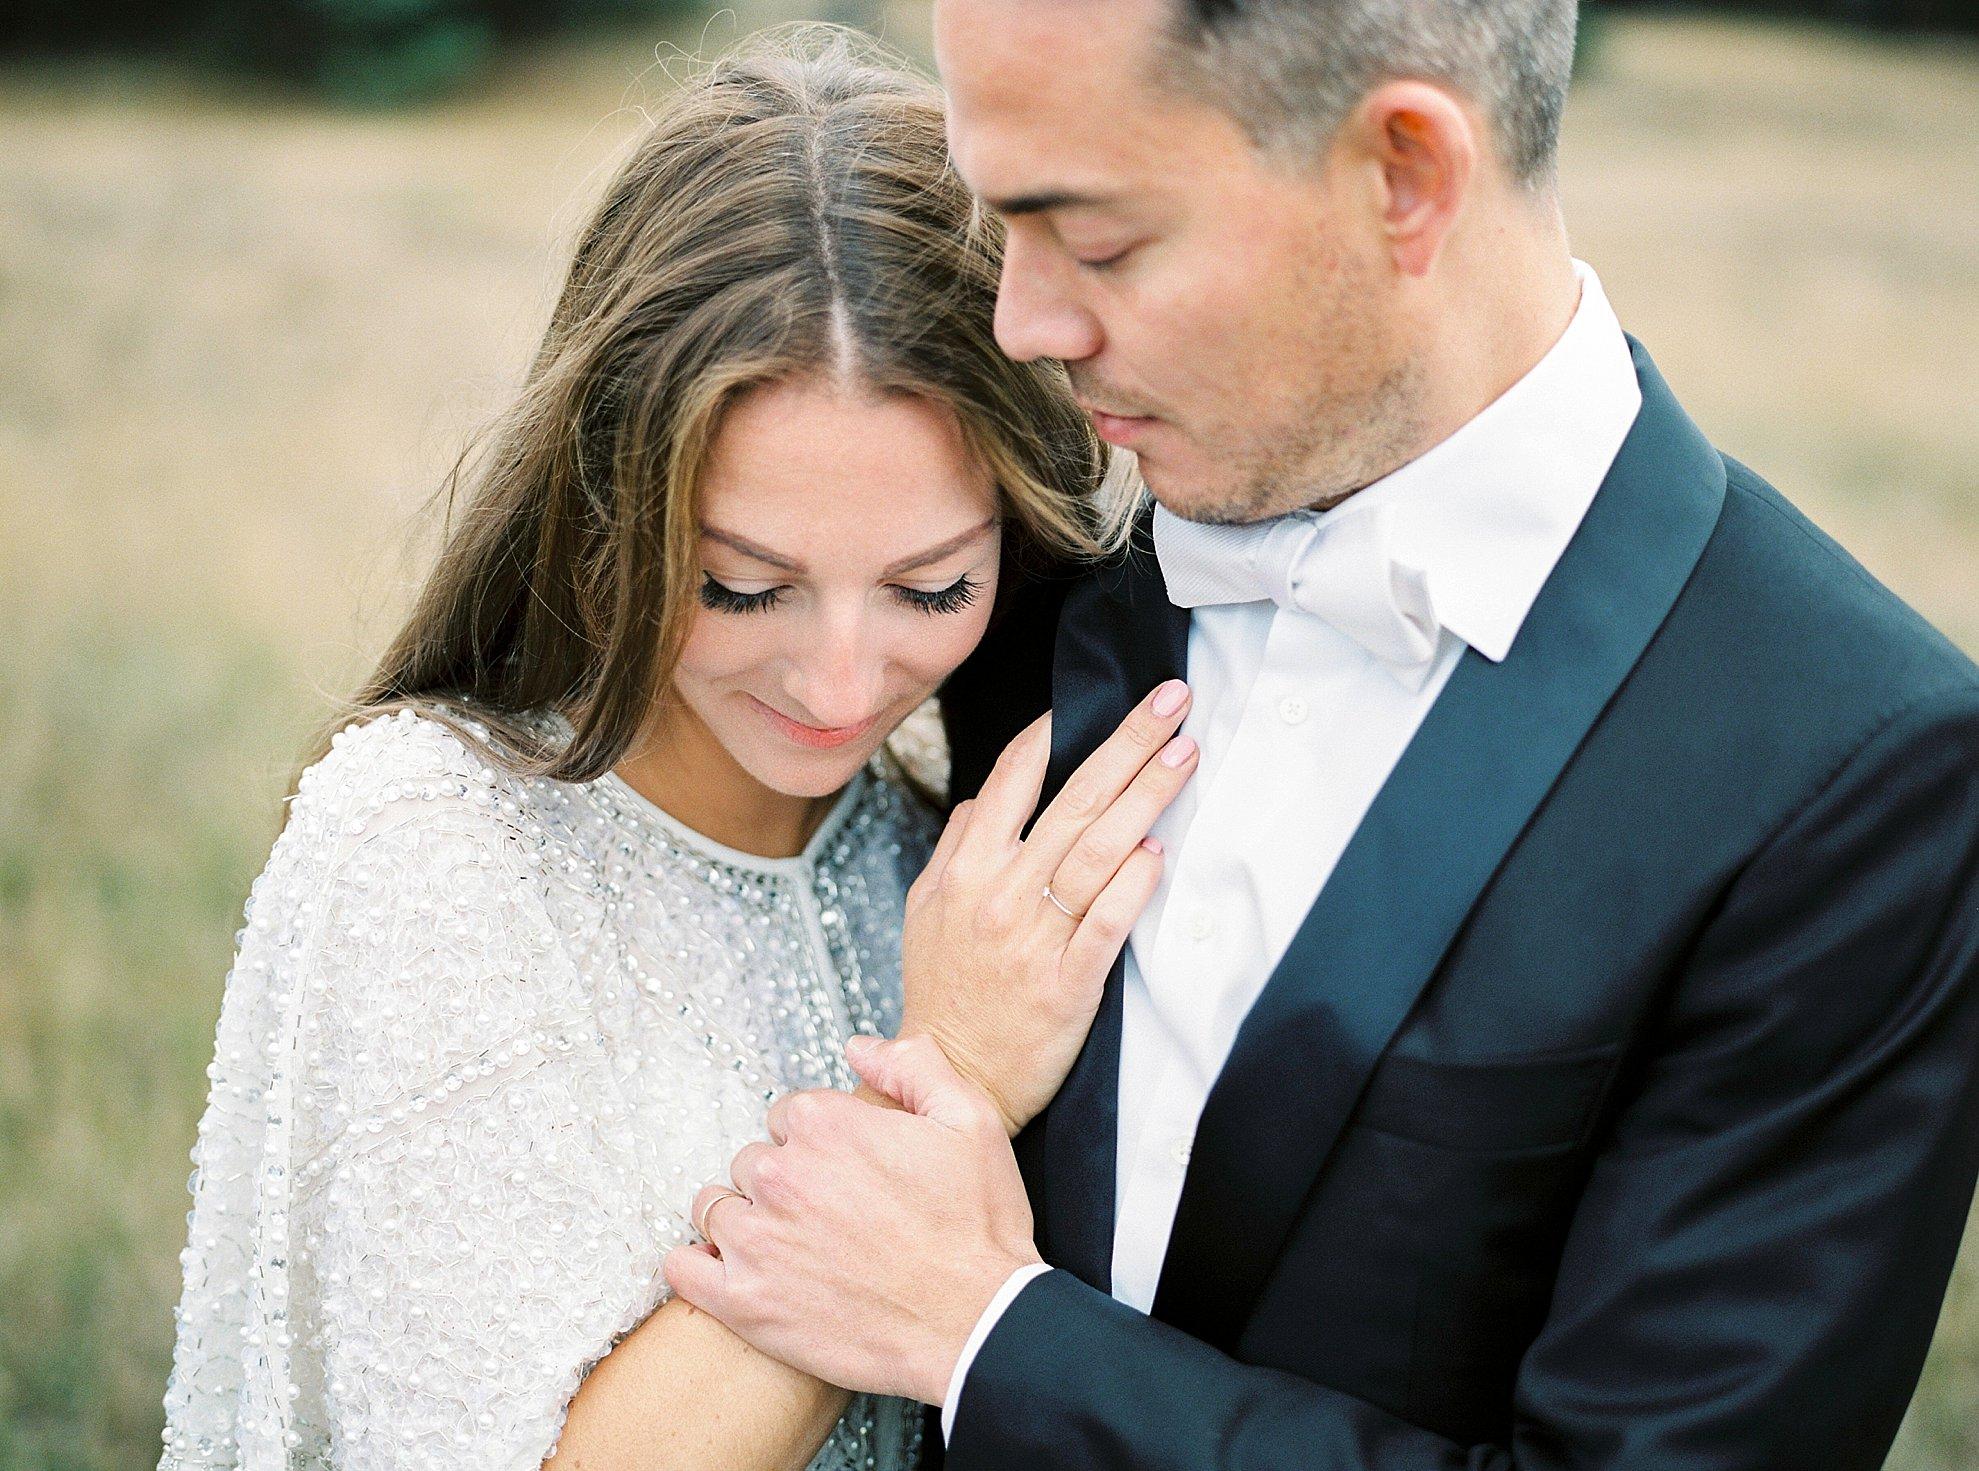 Amanda-Drost-photography-fine-art-nederland-couple-shoot-editorial_0012.jpg